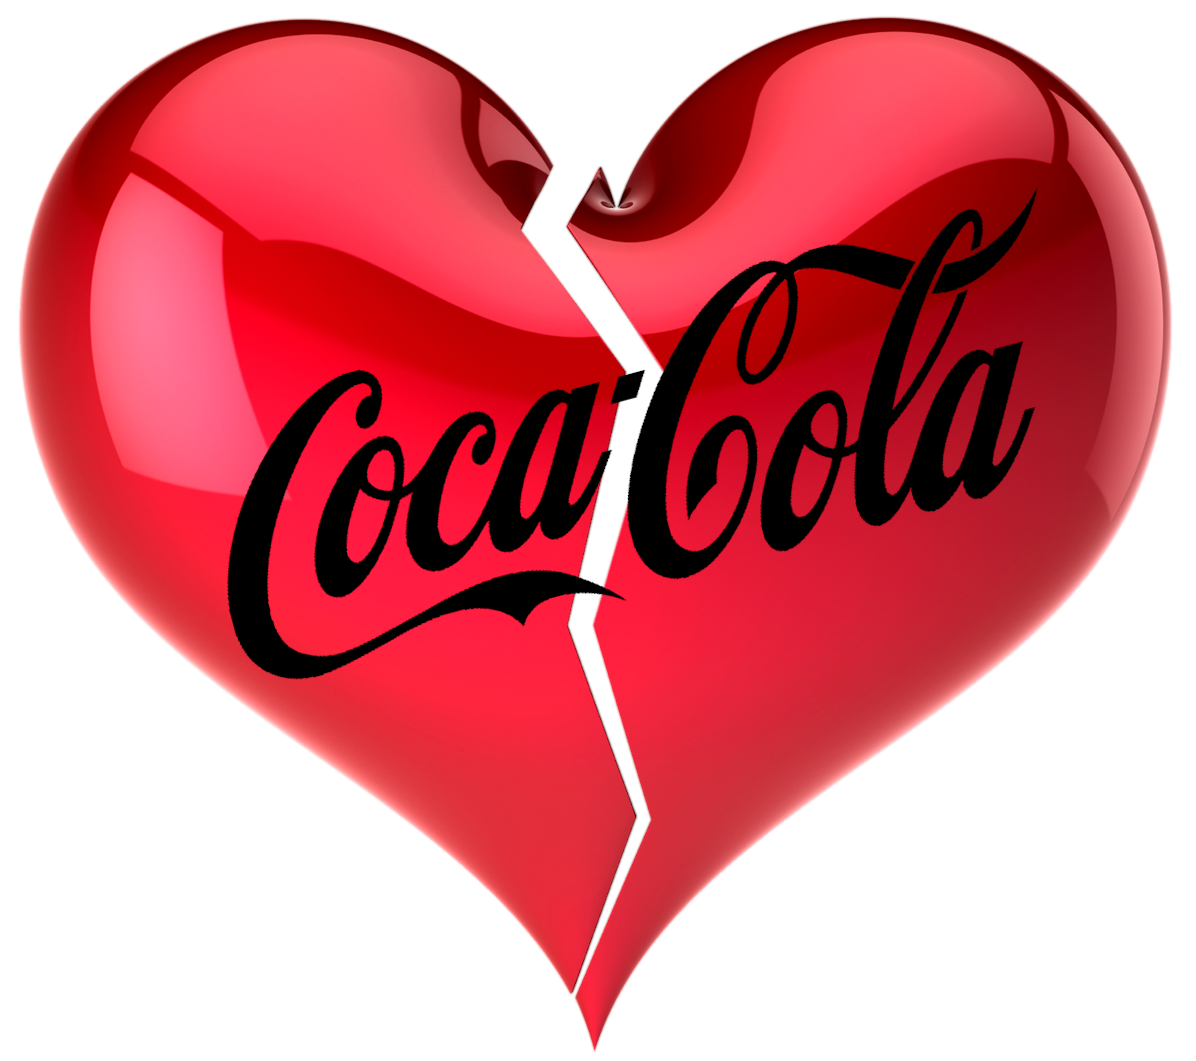 Am I Next? Coca-Cola Layoff in Atlanta, Georgia